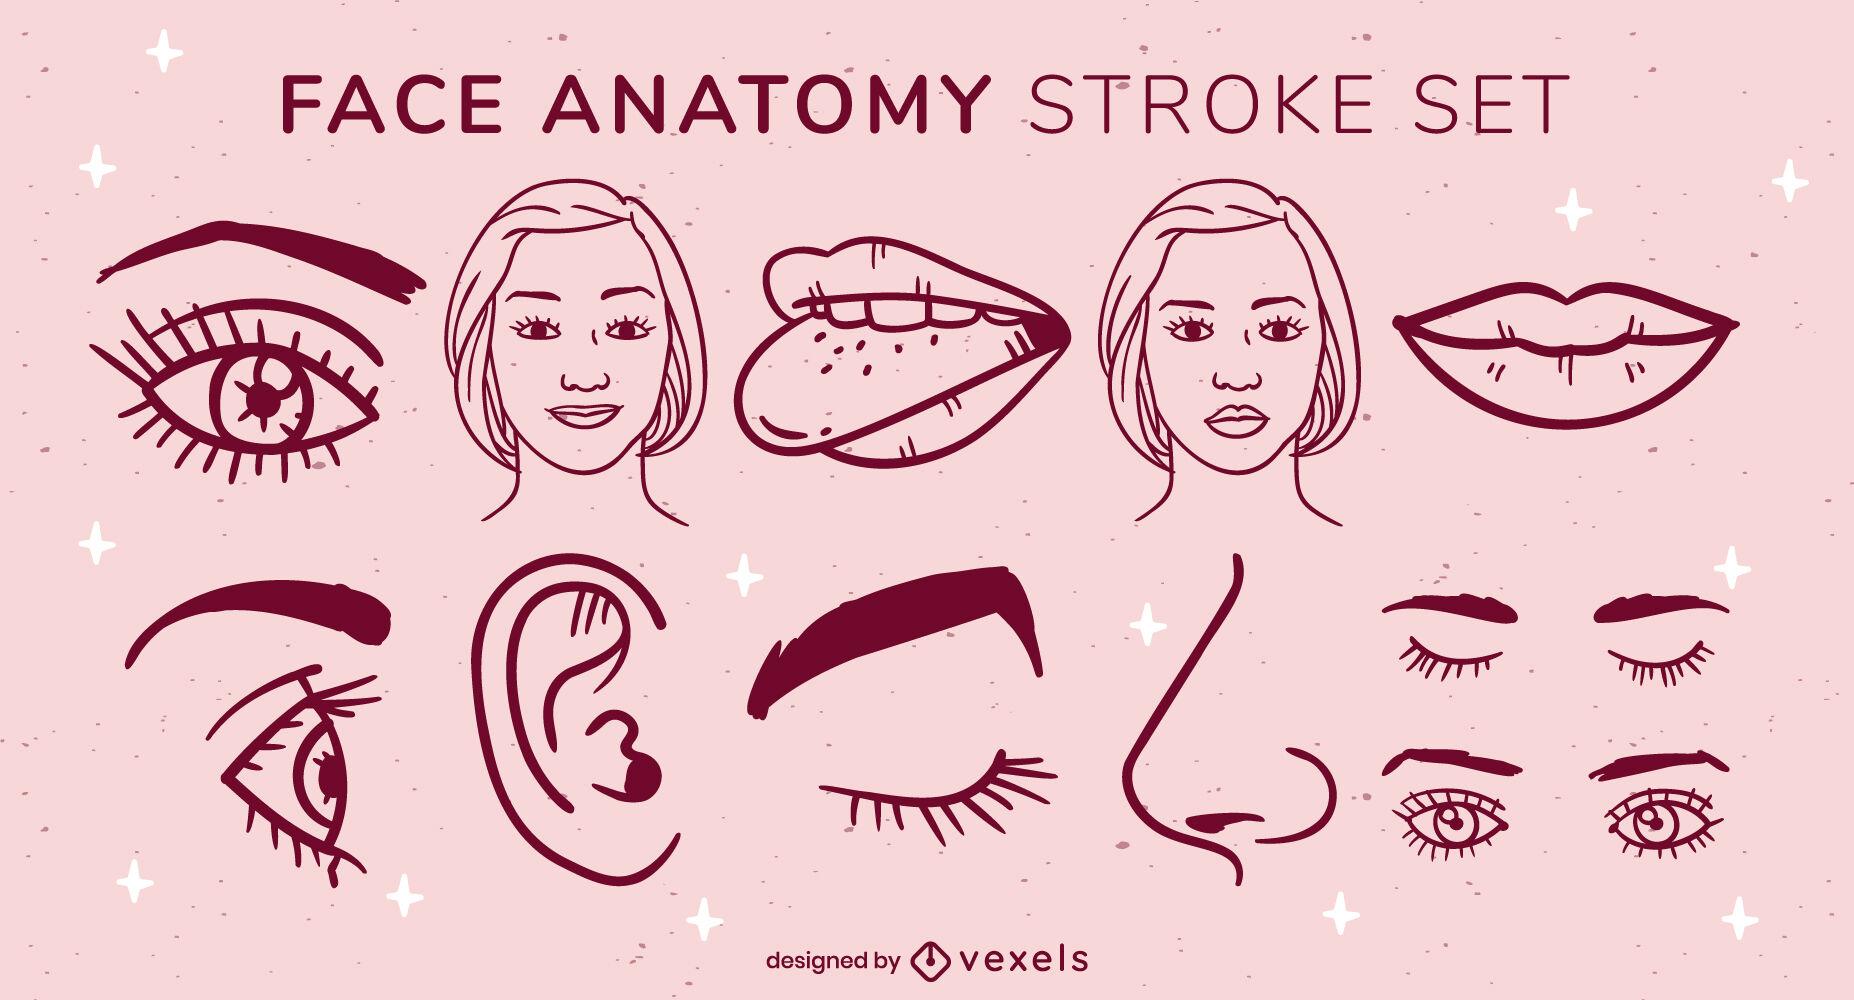 Elementos de anatomía facial establecen trazo